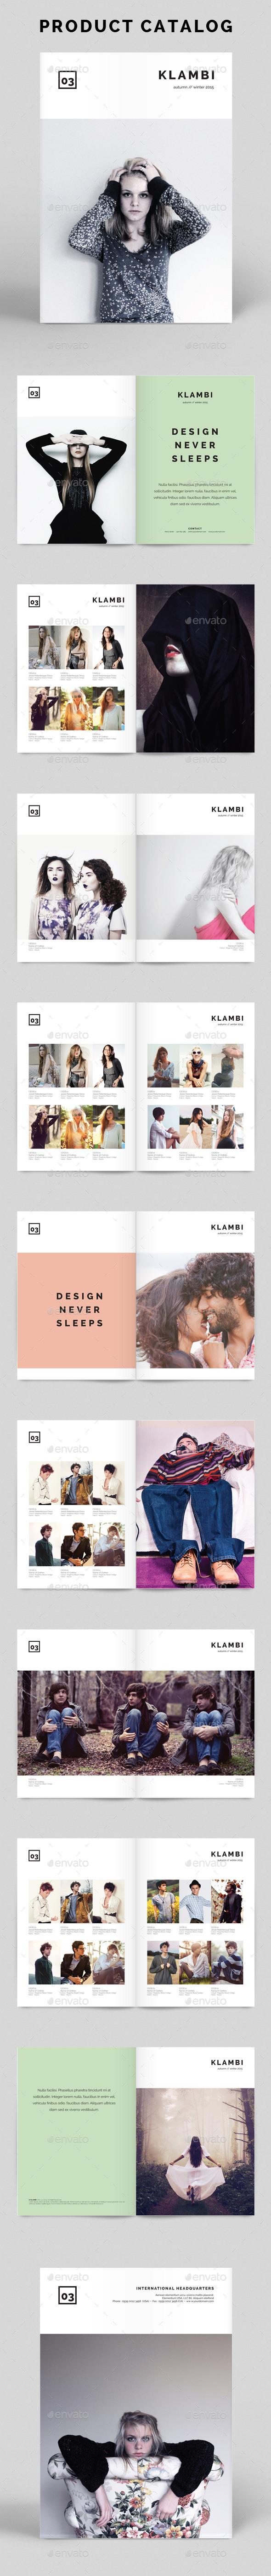 Product Catalog Klambi Template - Catalogs Brochures